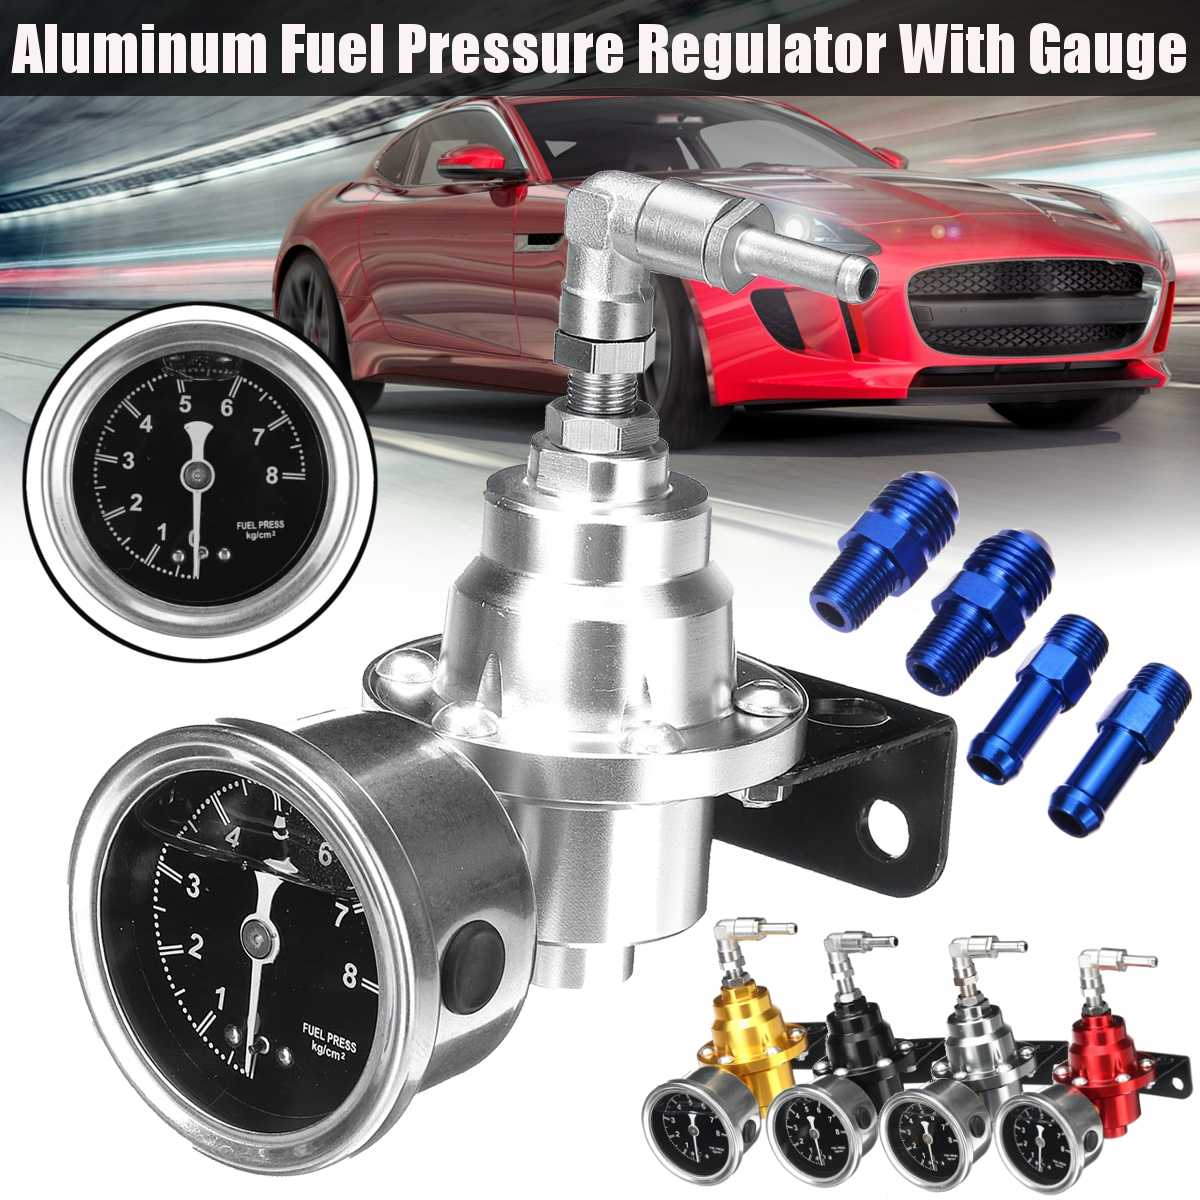 Universal Adjustable Aluminum Fuel Pressure Regulator With Gauge Kit Black Titanium Red Gold Silver Blue